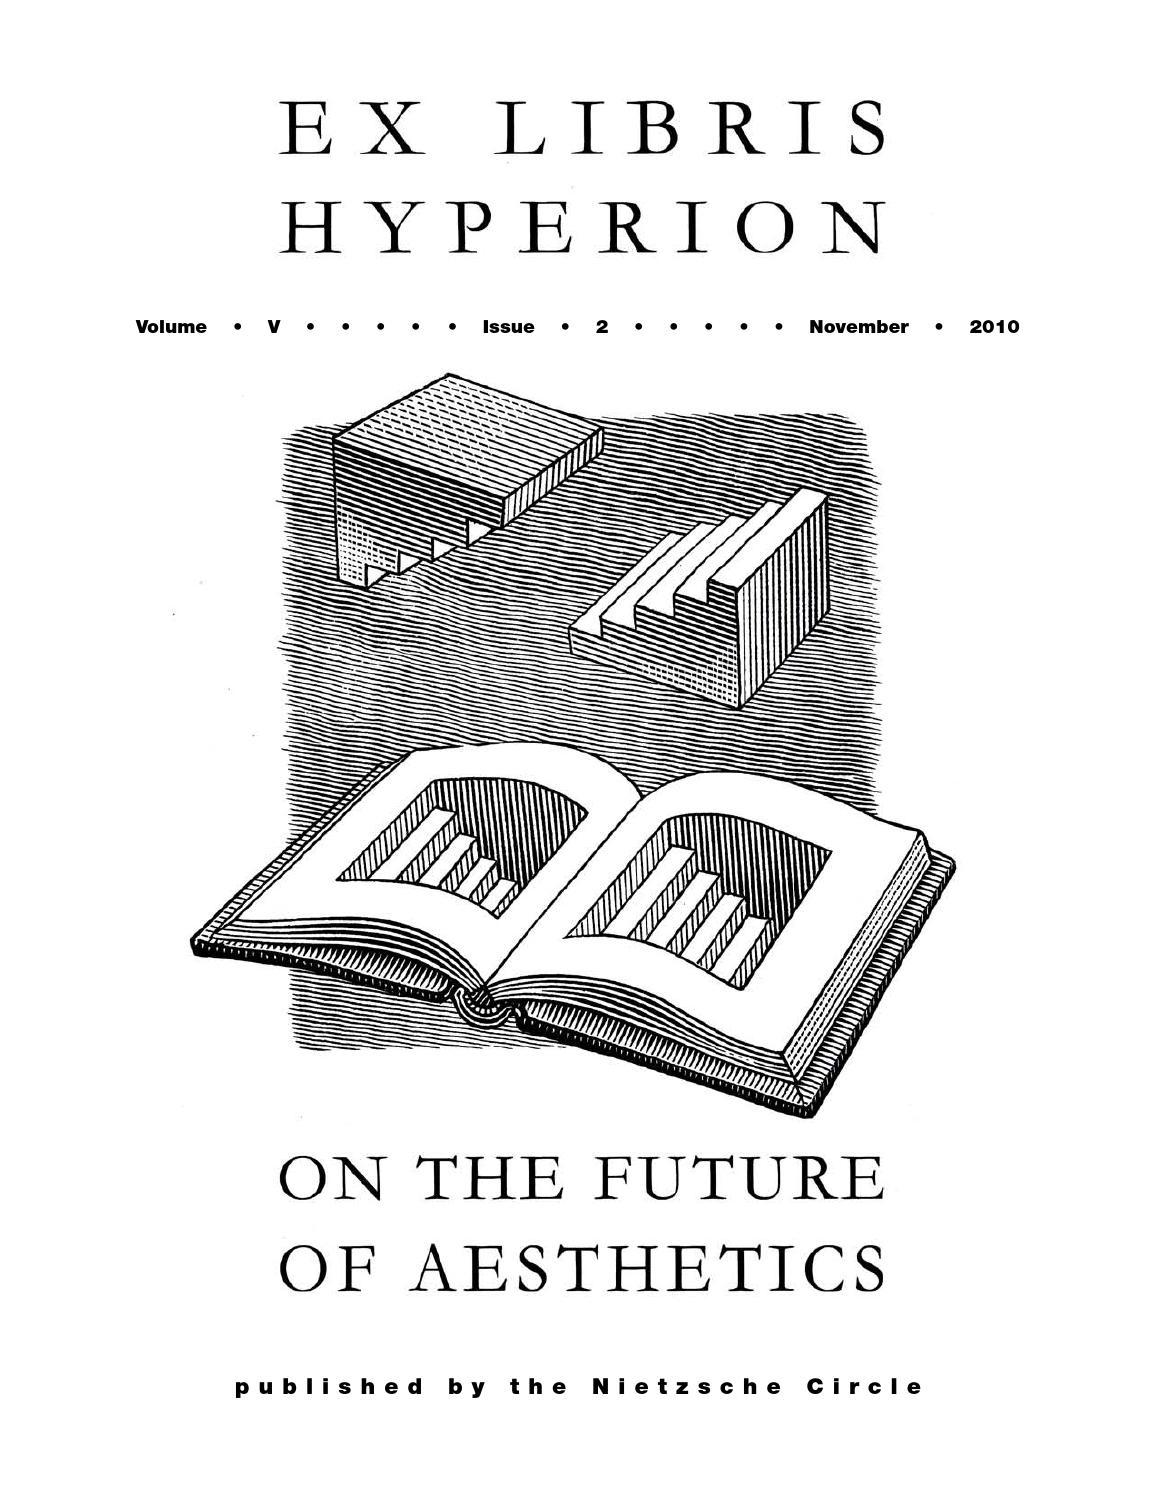 Hyperion, Vol. 5, No. 2 by Contra Mundum Press - issuu